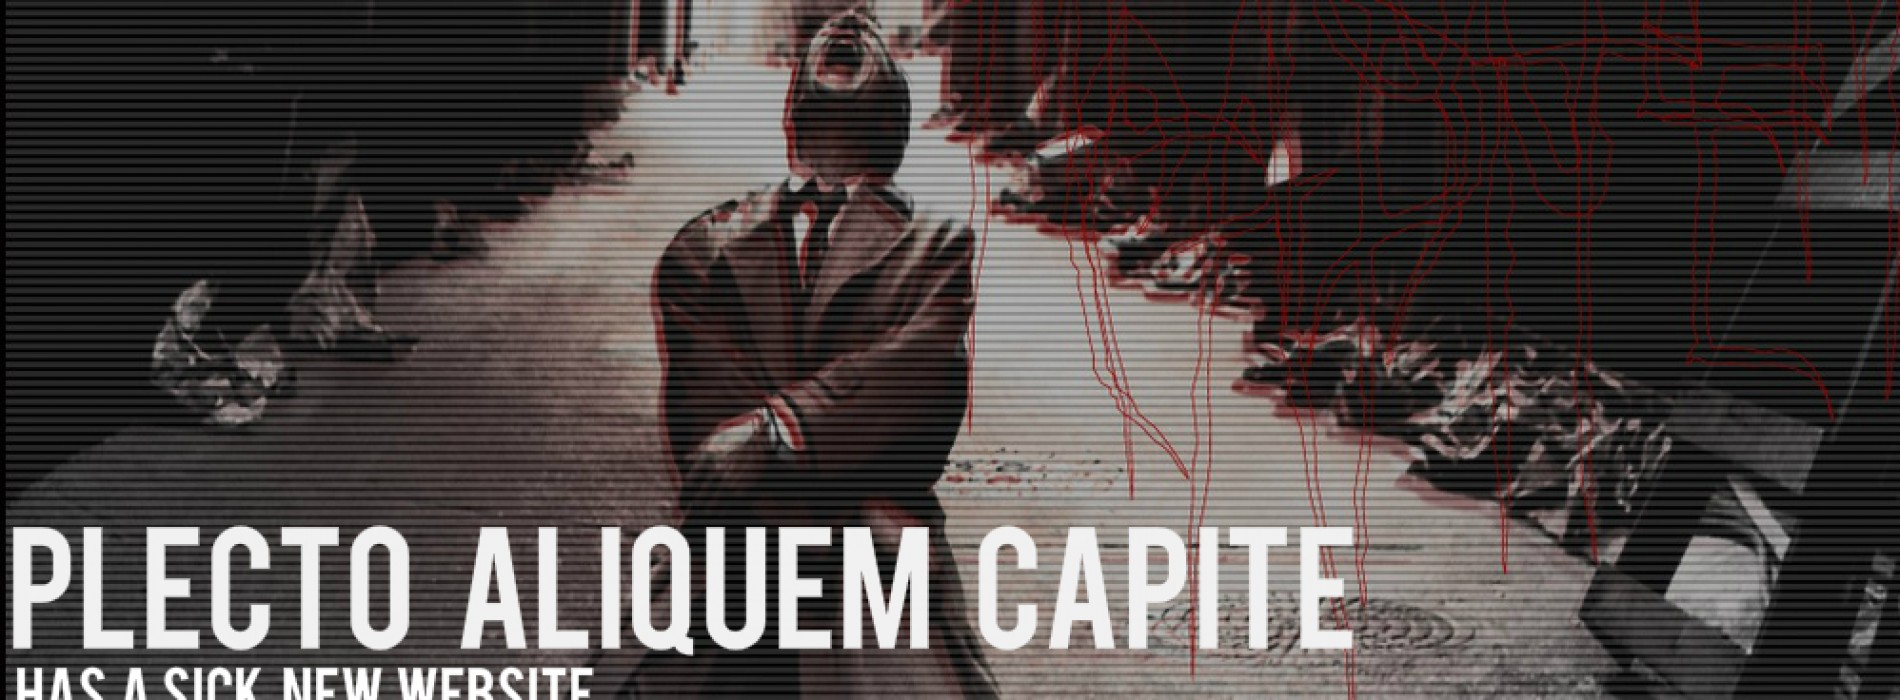 Plecto Aliquem Capite Has A Website